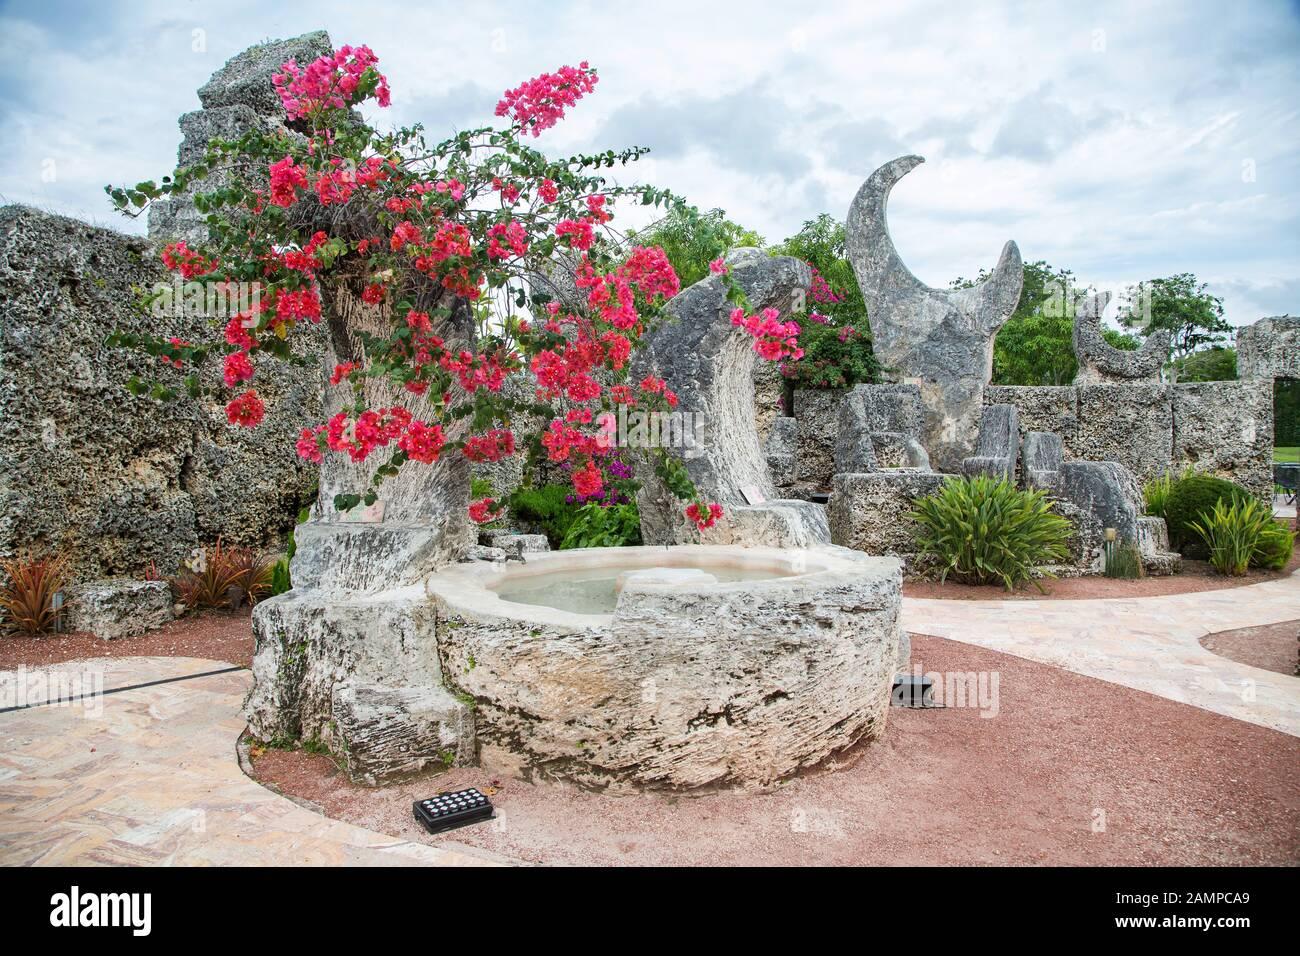 Garden with limestones, Coral Castle Museum, Homestead, Florida, USA Stock Photo